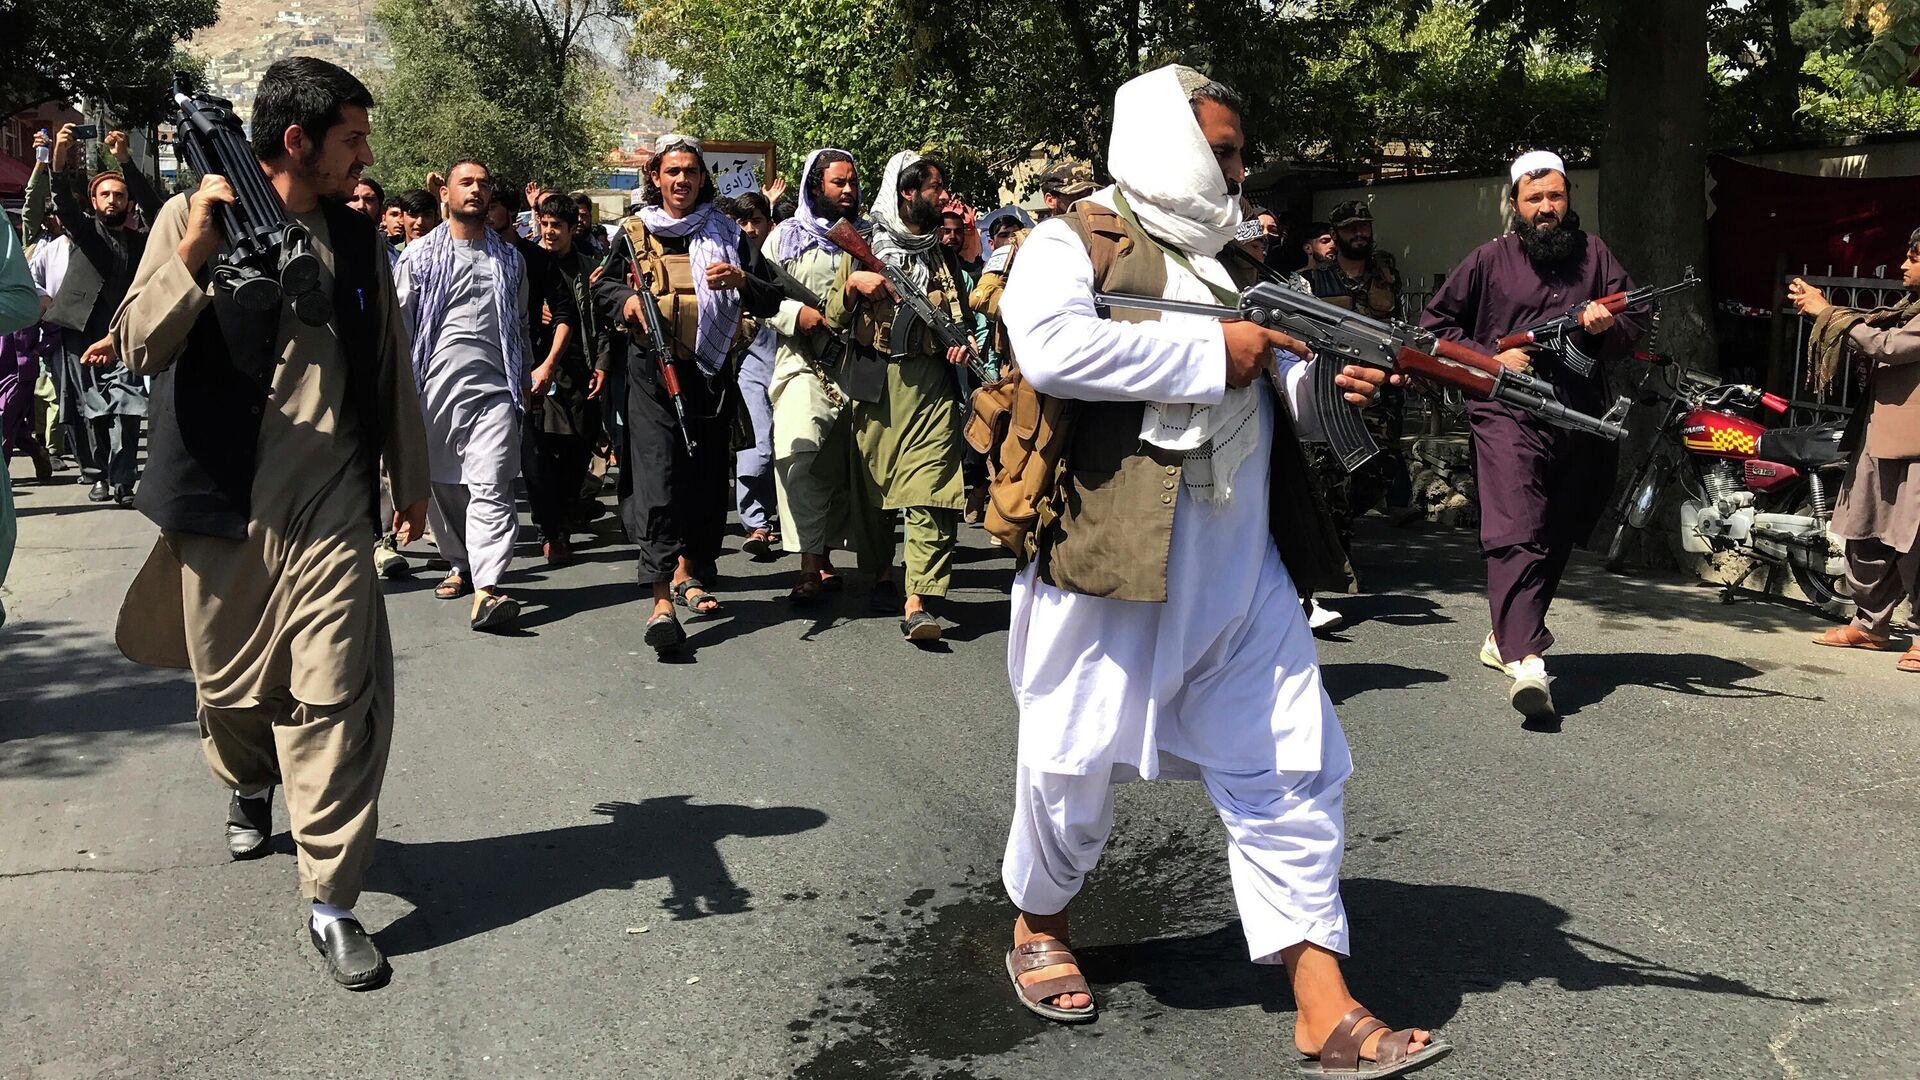 Боевики Талибана* на улице Кабула - РИА Новости, 1920, 11.09.2021